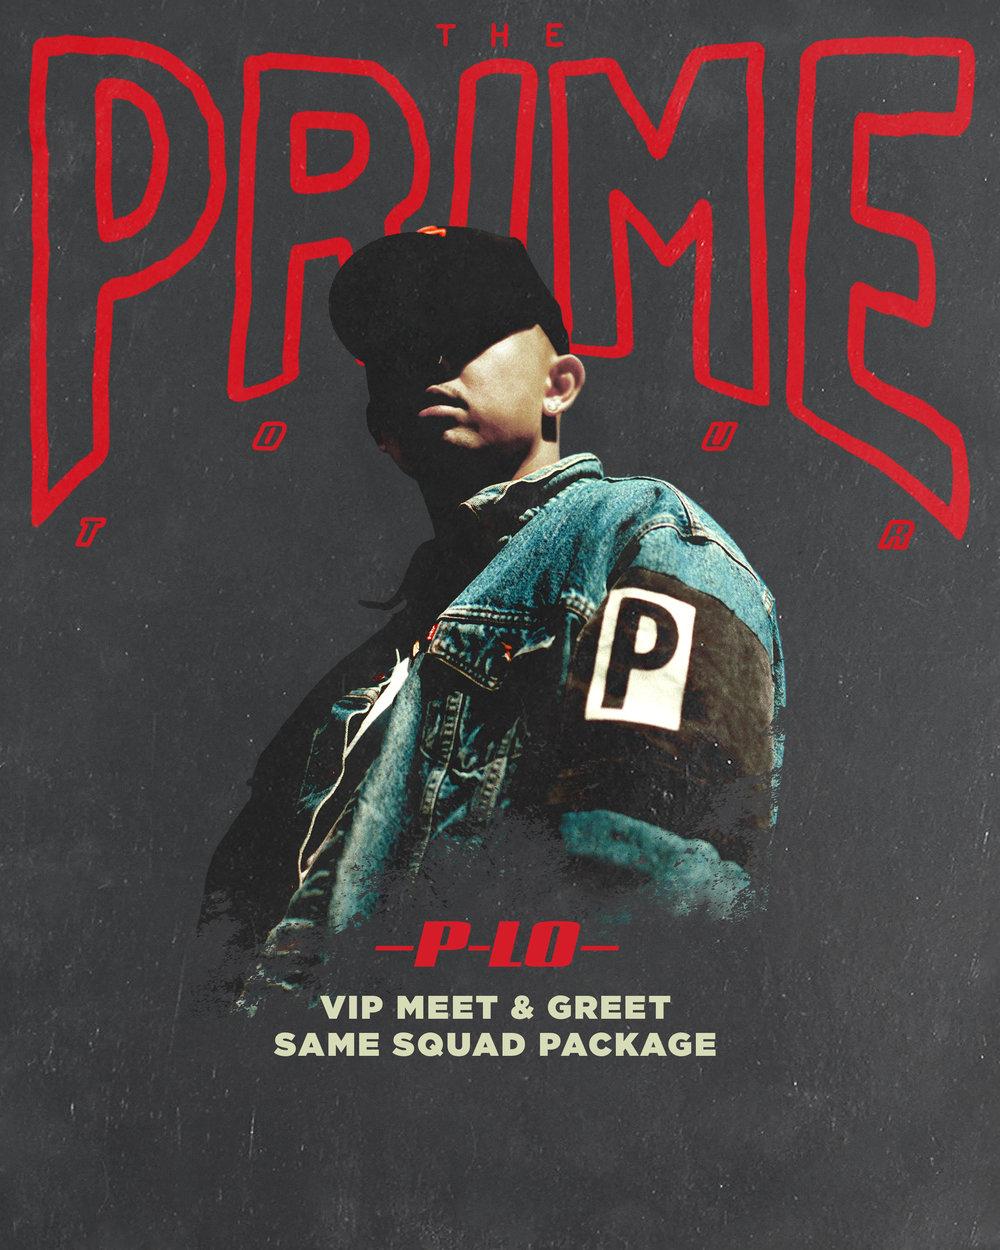 PRIME_PLO_TOUR_SS.jpg